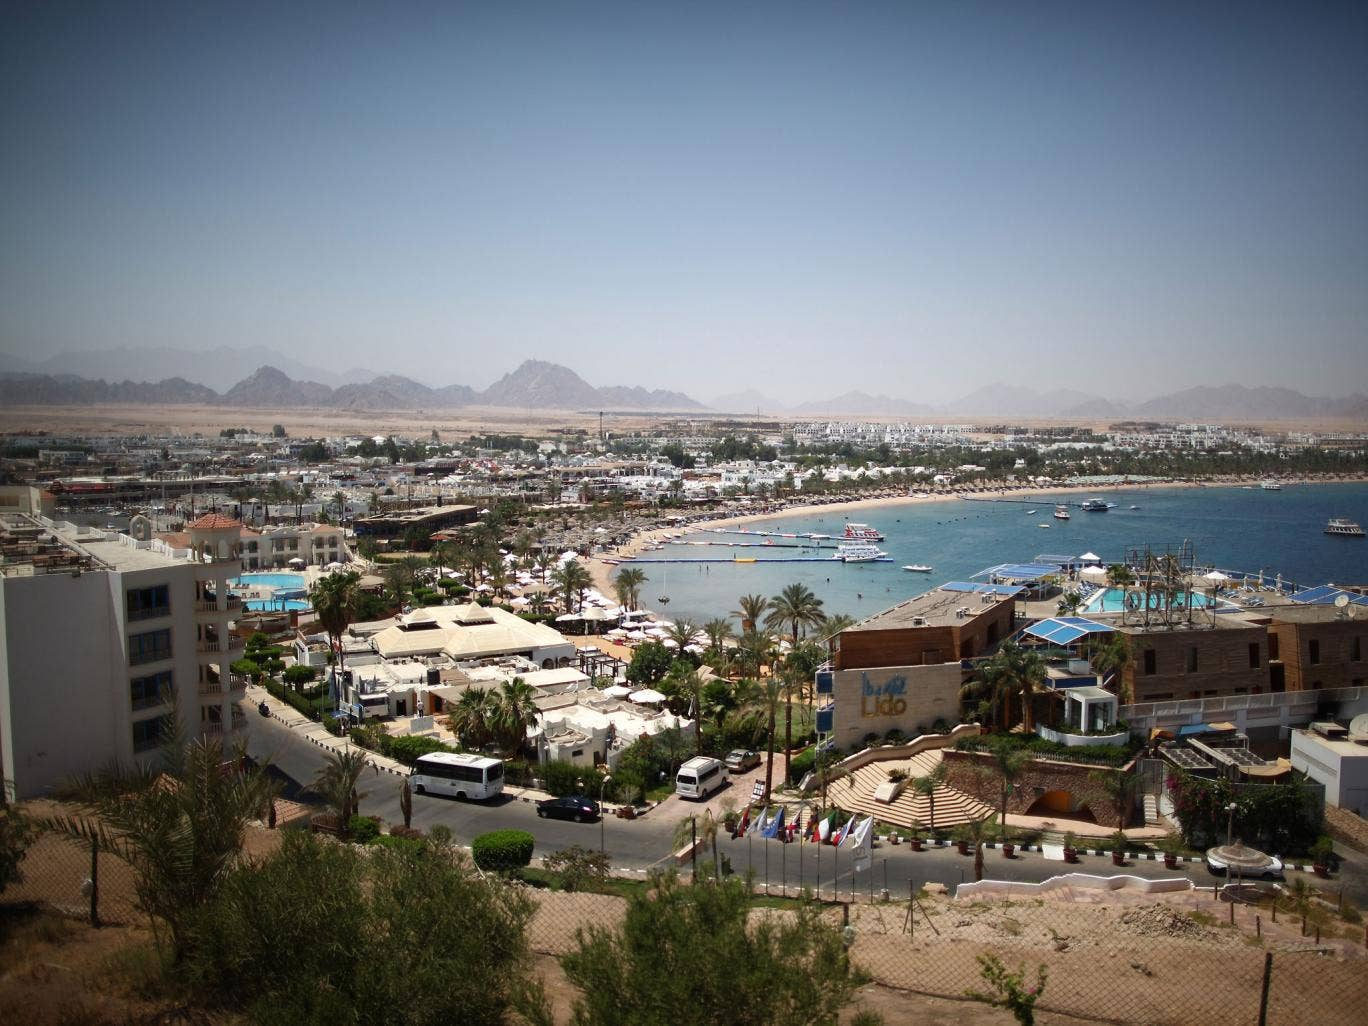 The popular Egyptian resort of Sharm el Sheikh